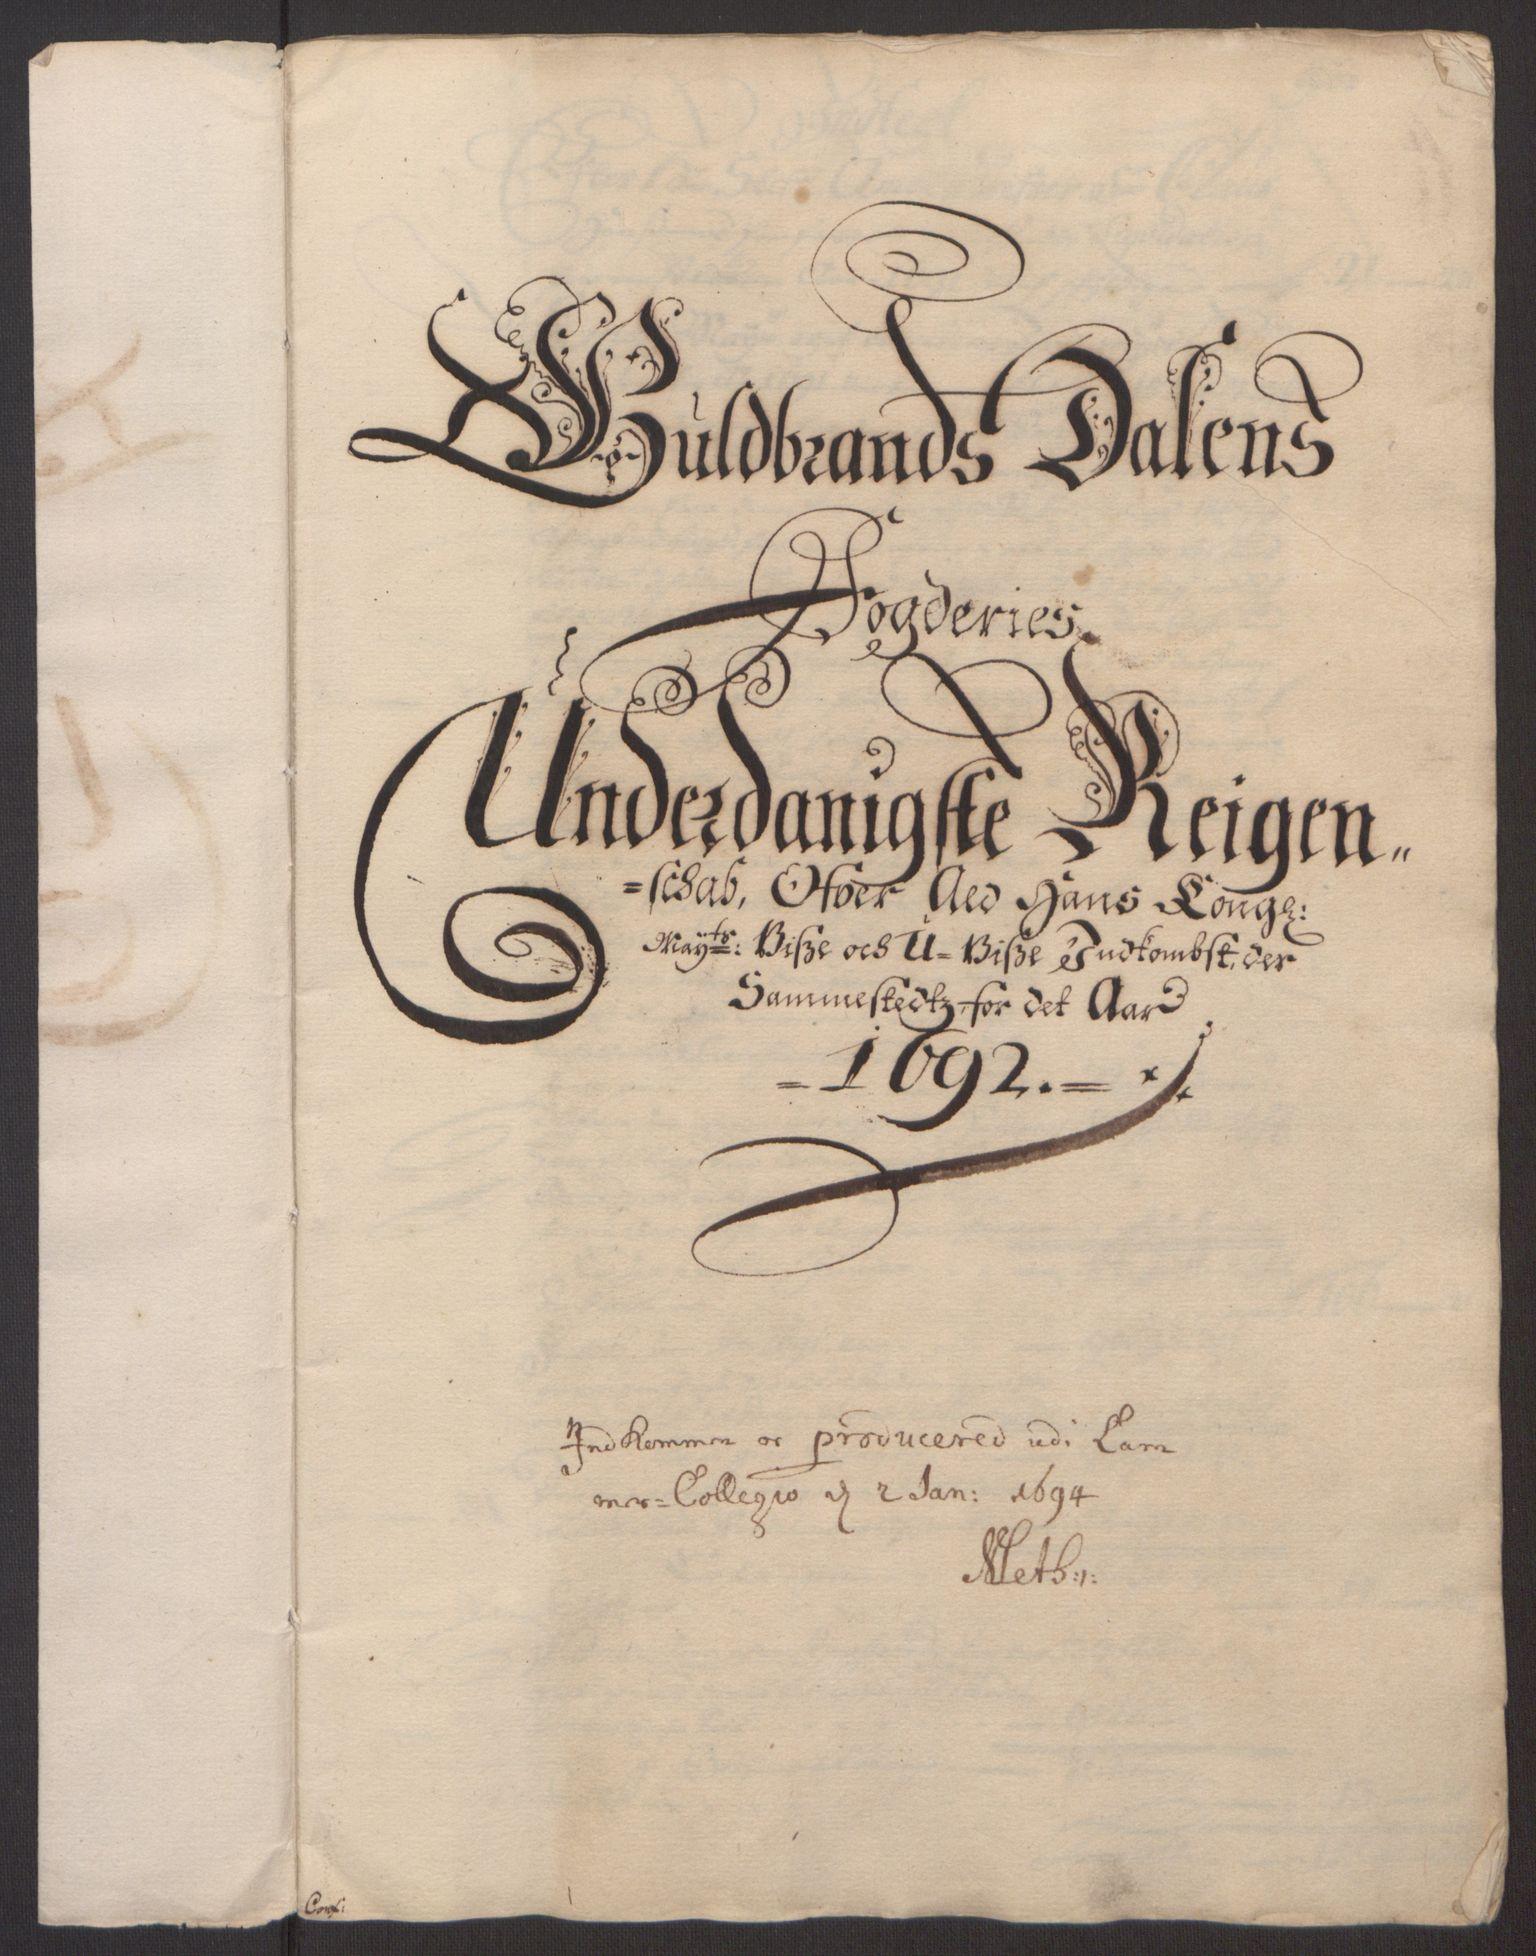 RA, Rentekammeret inntil 1814, Reviderte regnskaper, Fogderegnskap, R17/L1166: Fogderegnskap Gudbrandsdal, 1690-1692, s. 3